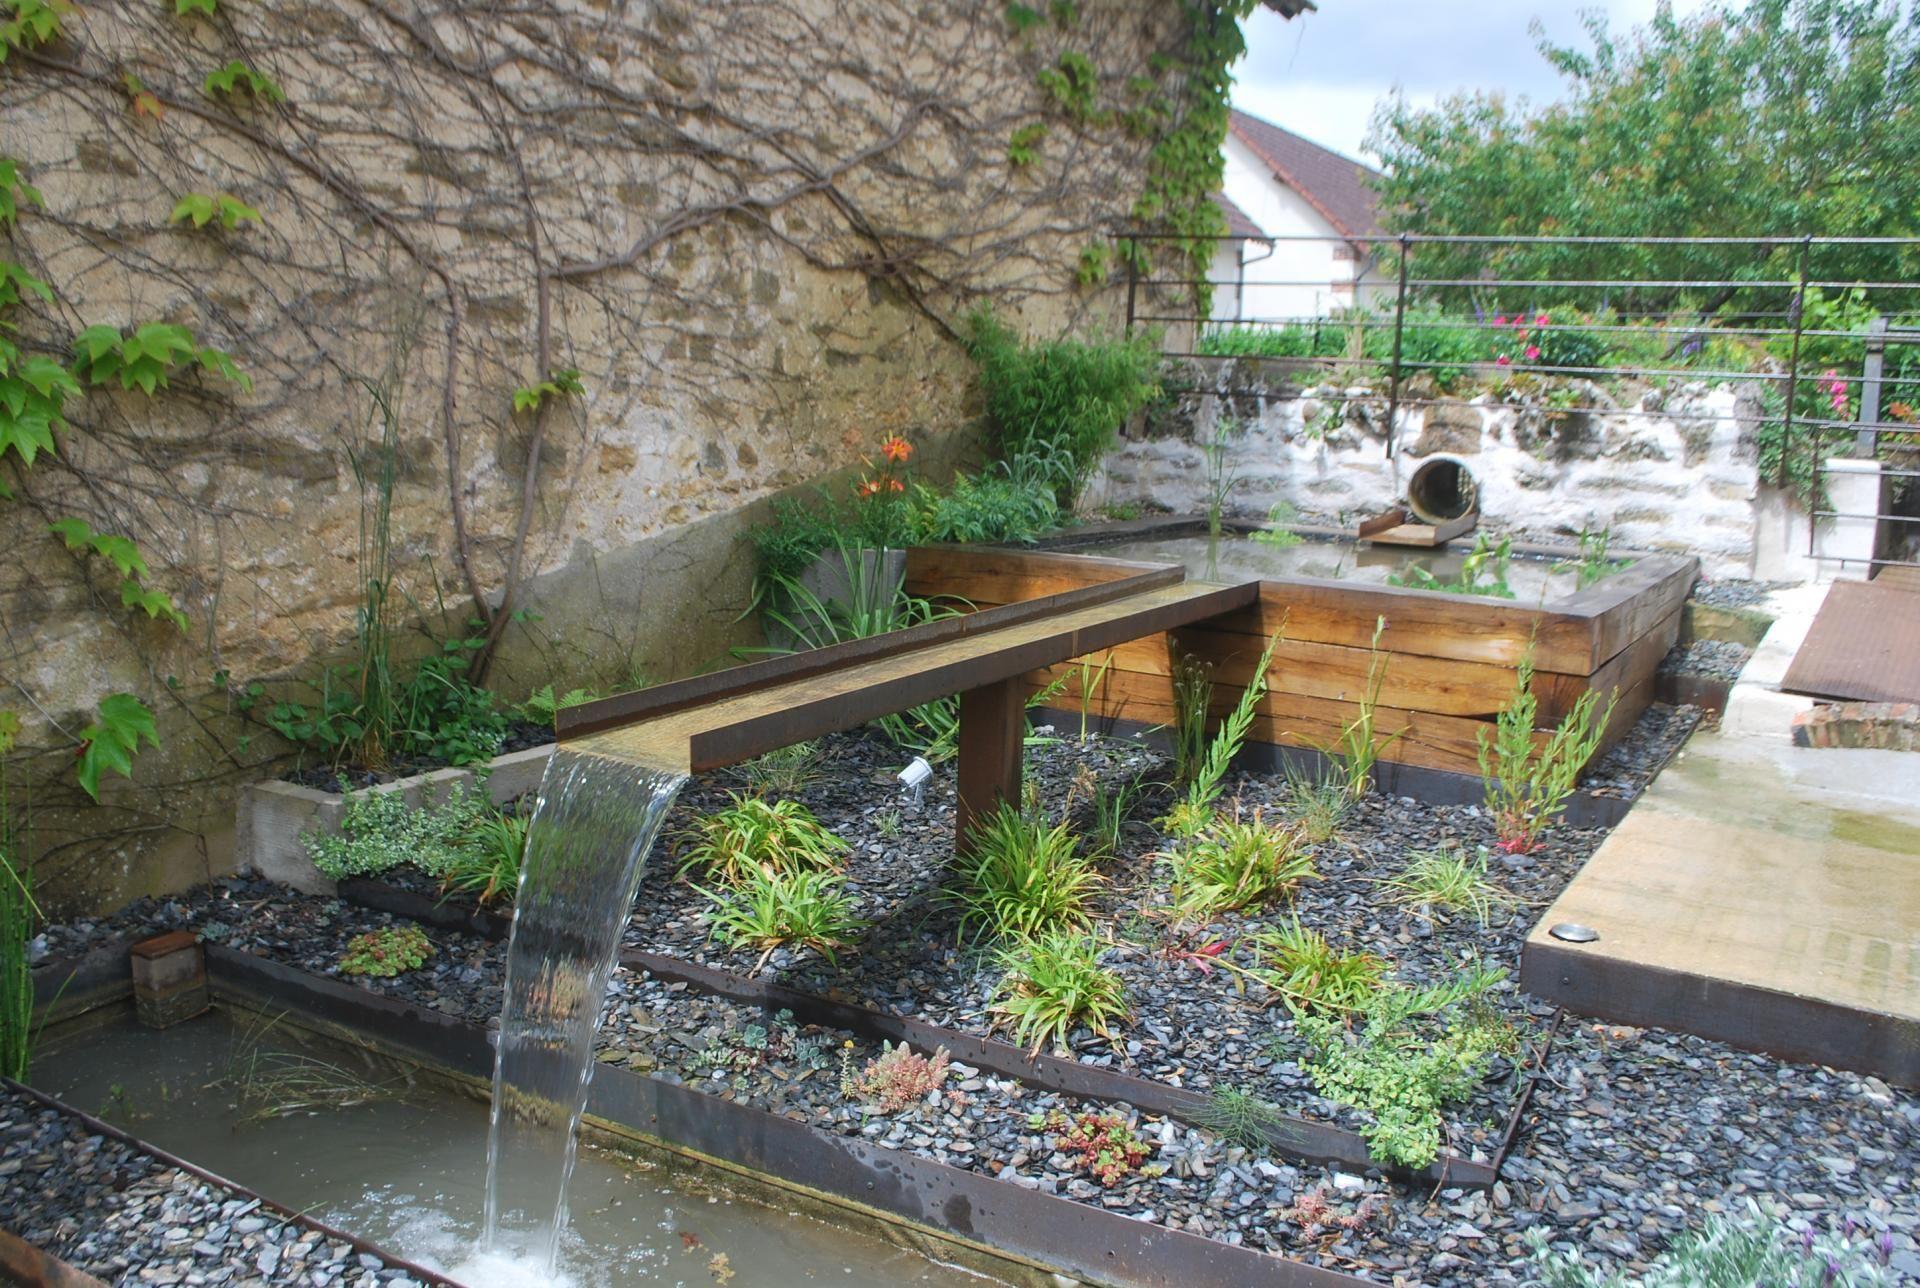 Jardin Idee Paysage - La construction d\'une Jardin Idee ...